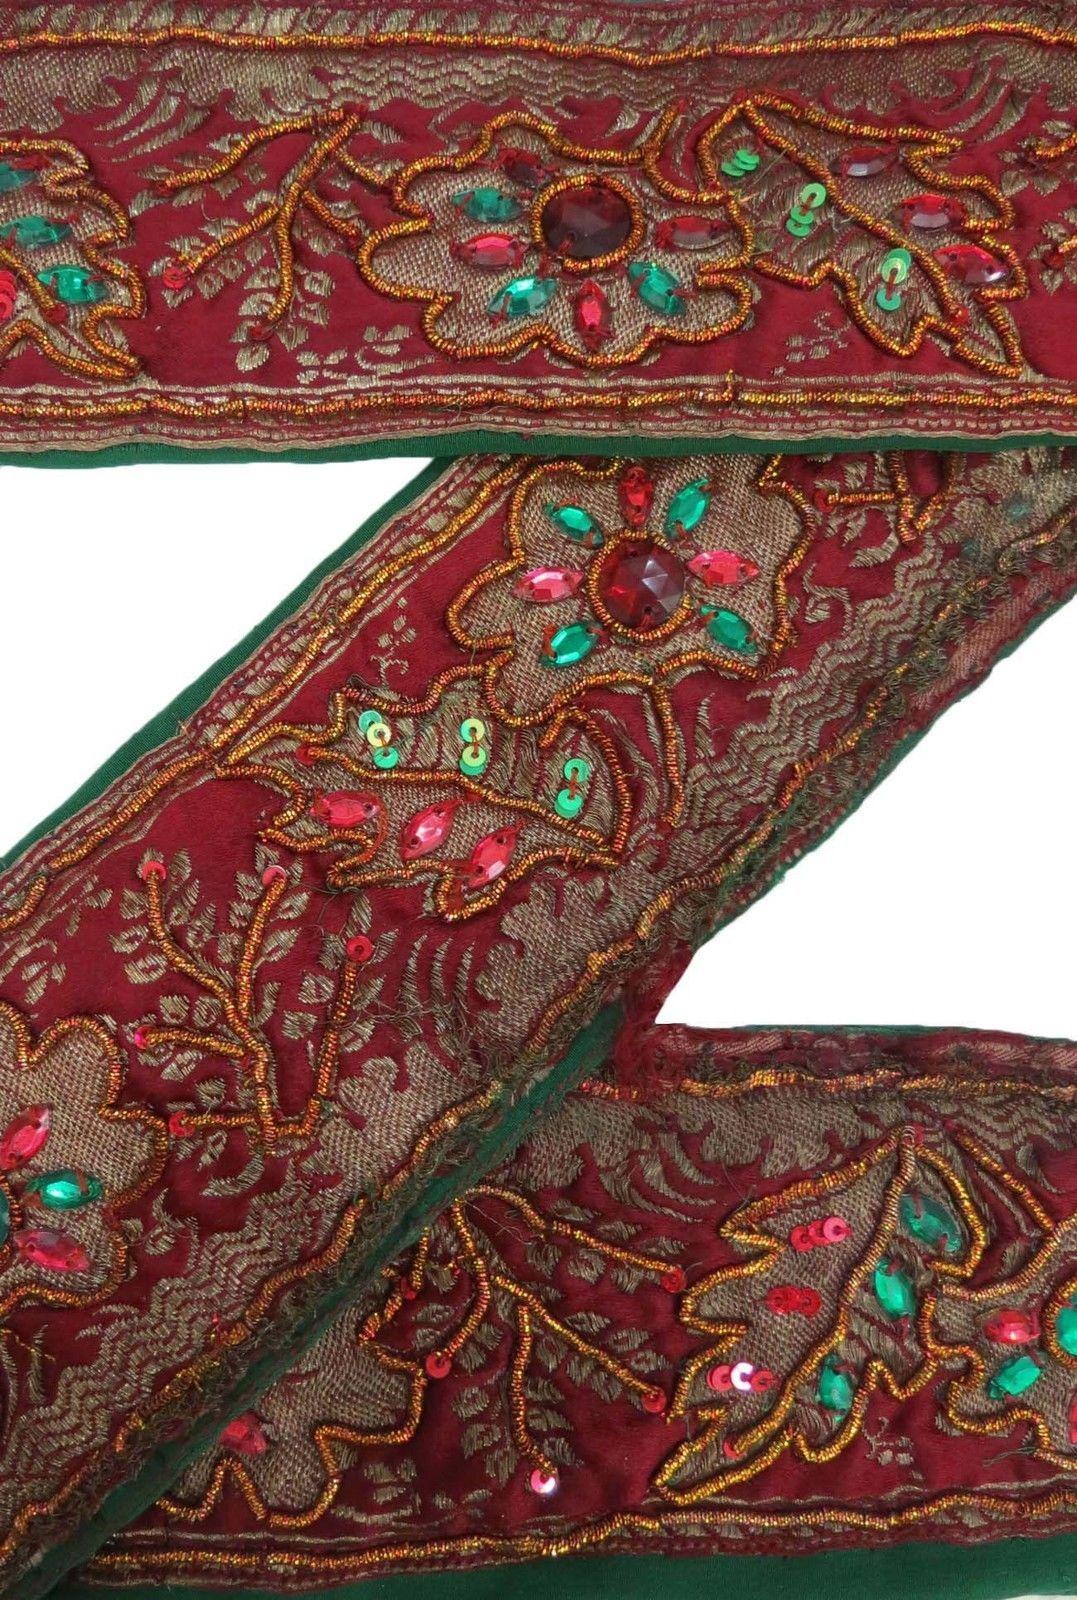 Lace, Crochet & Doilies Good Vintage Sari Border Antique Hand Embroidered Indian Trim Ribbon Peach Lace Trims